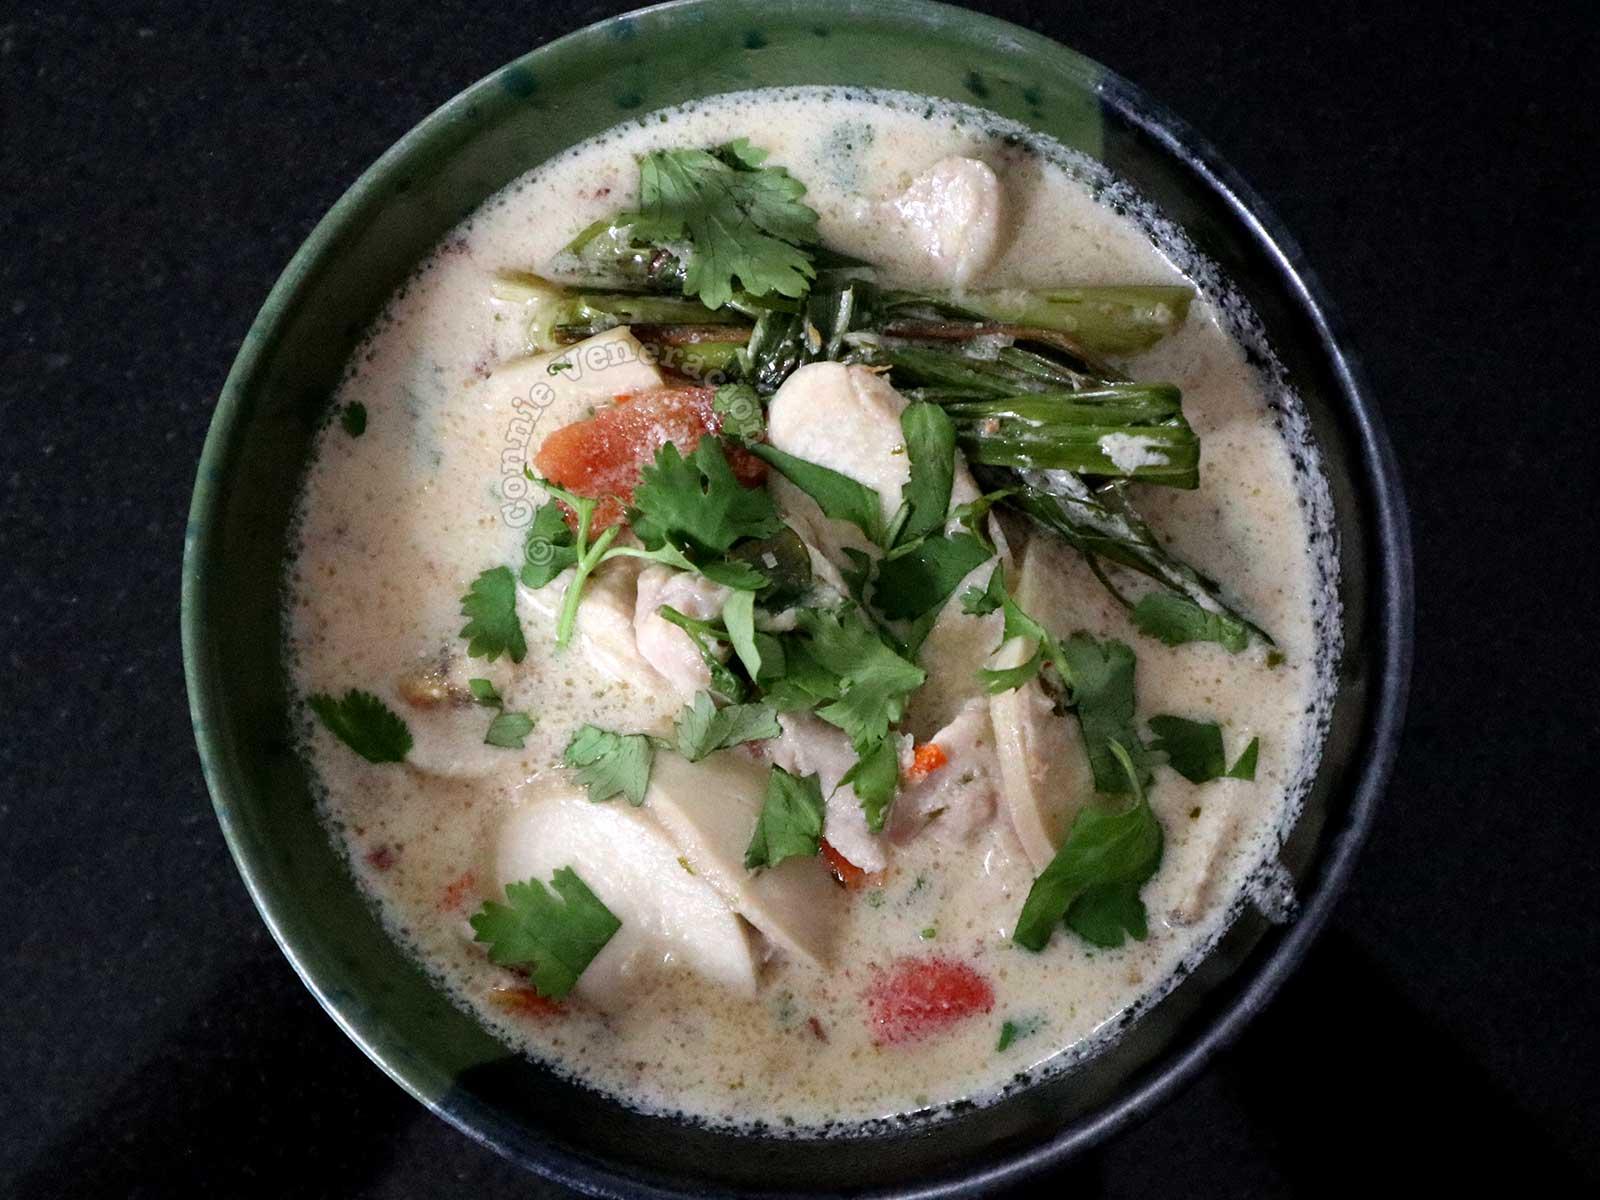 A serving of tom kha gai